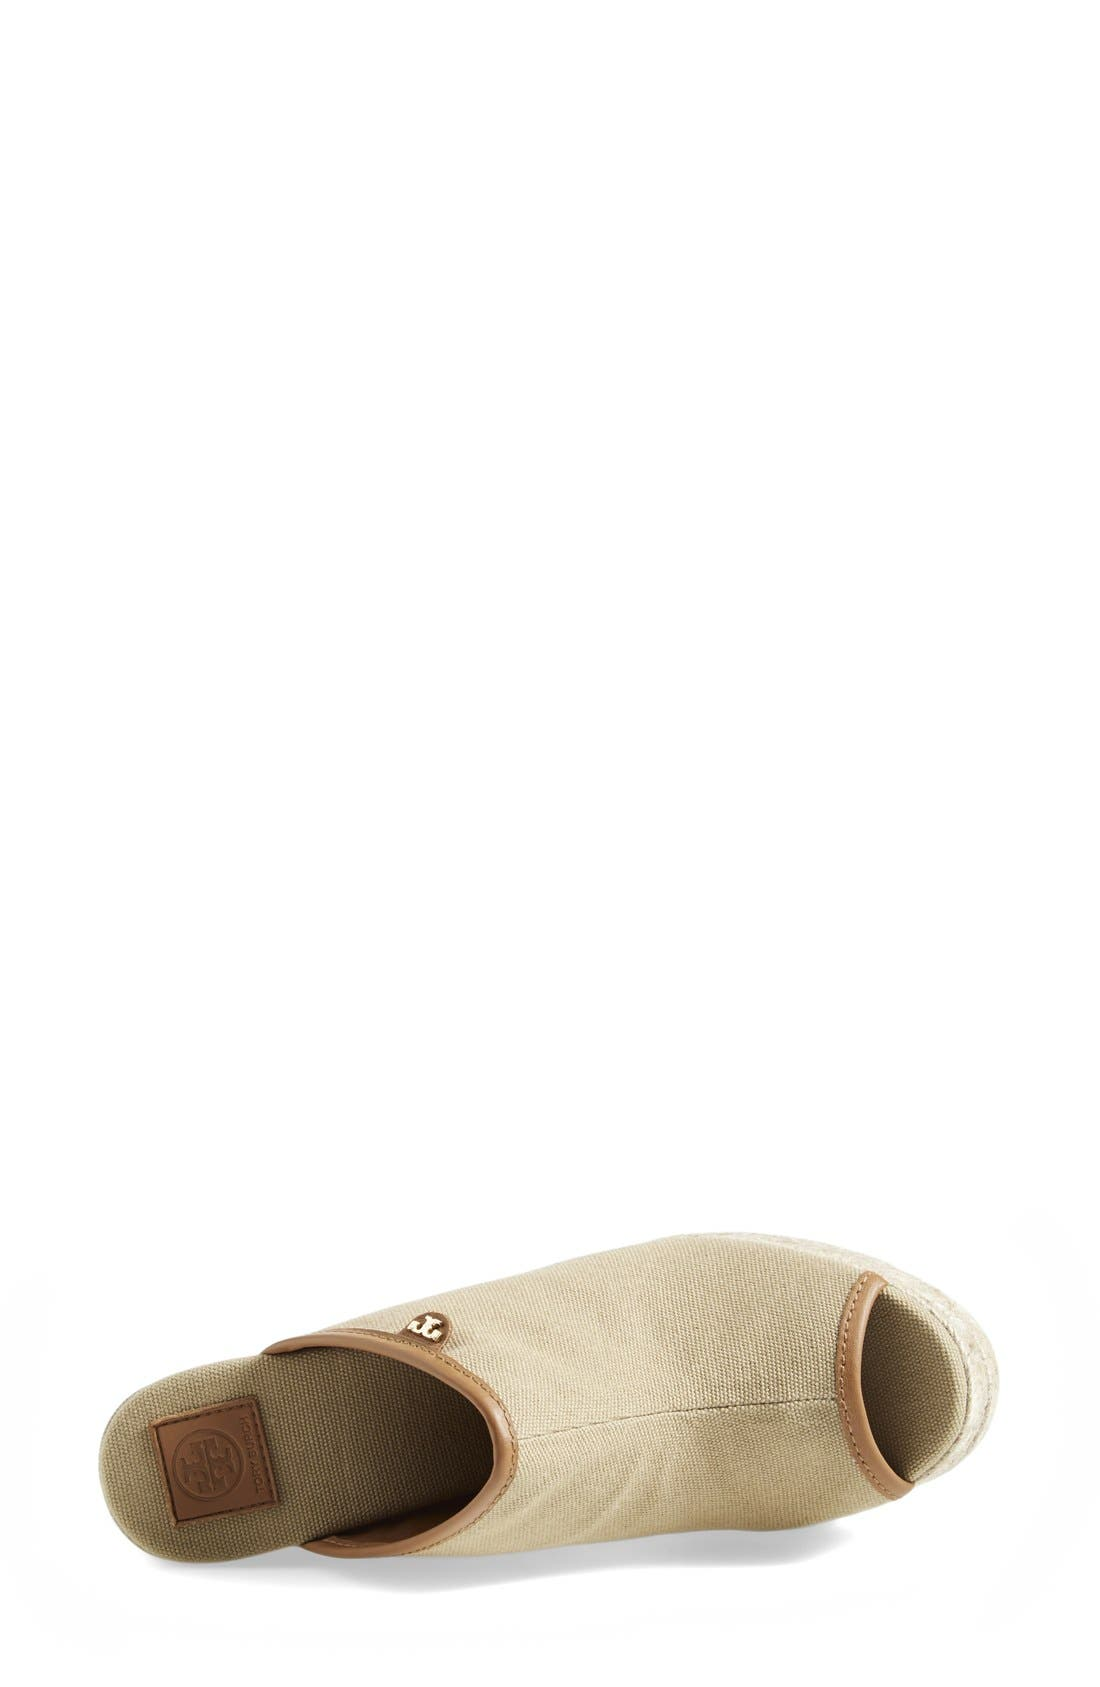 Alternate Image 3  - Tory Burch Canvas Wedge Sandal (Women)